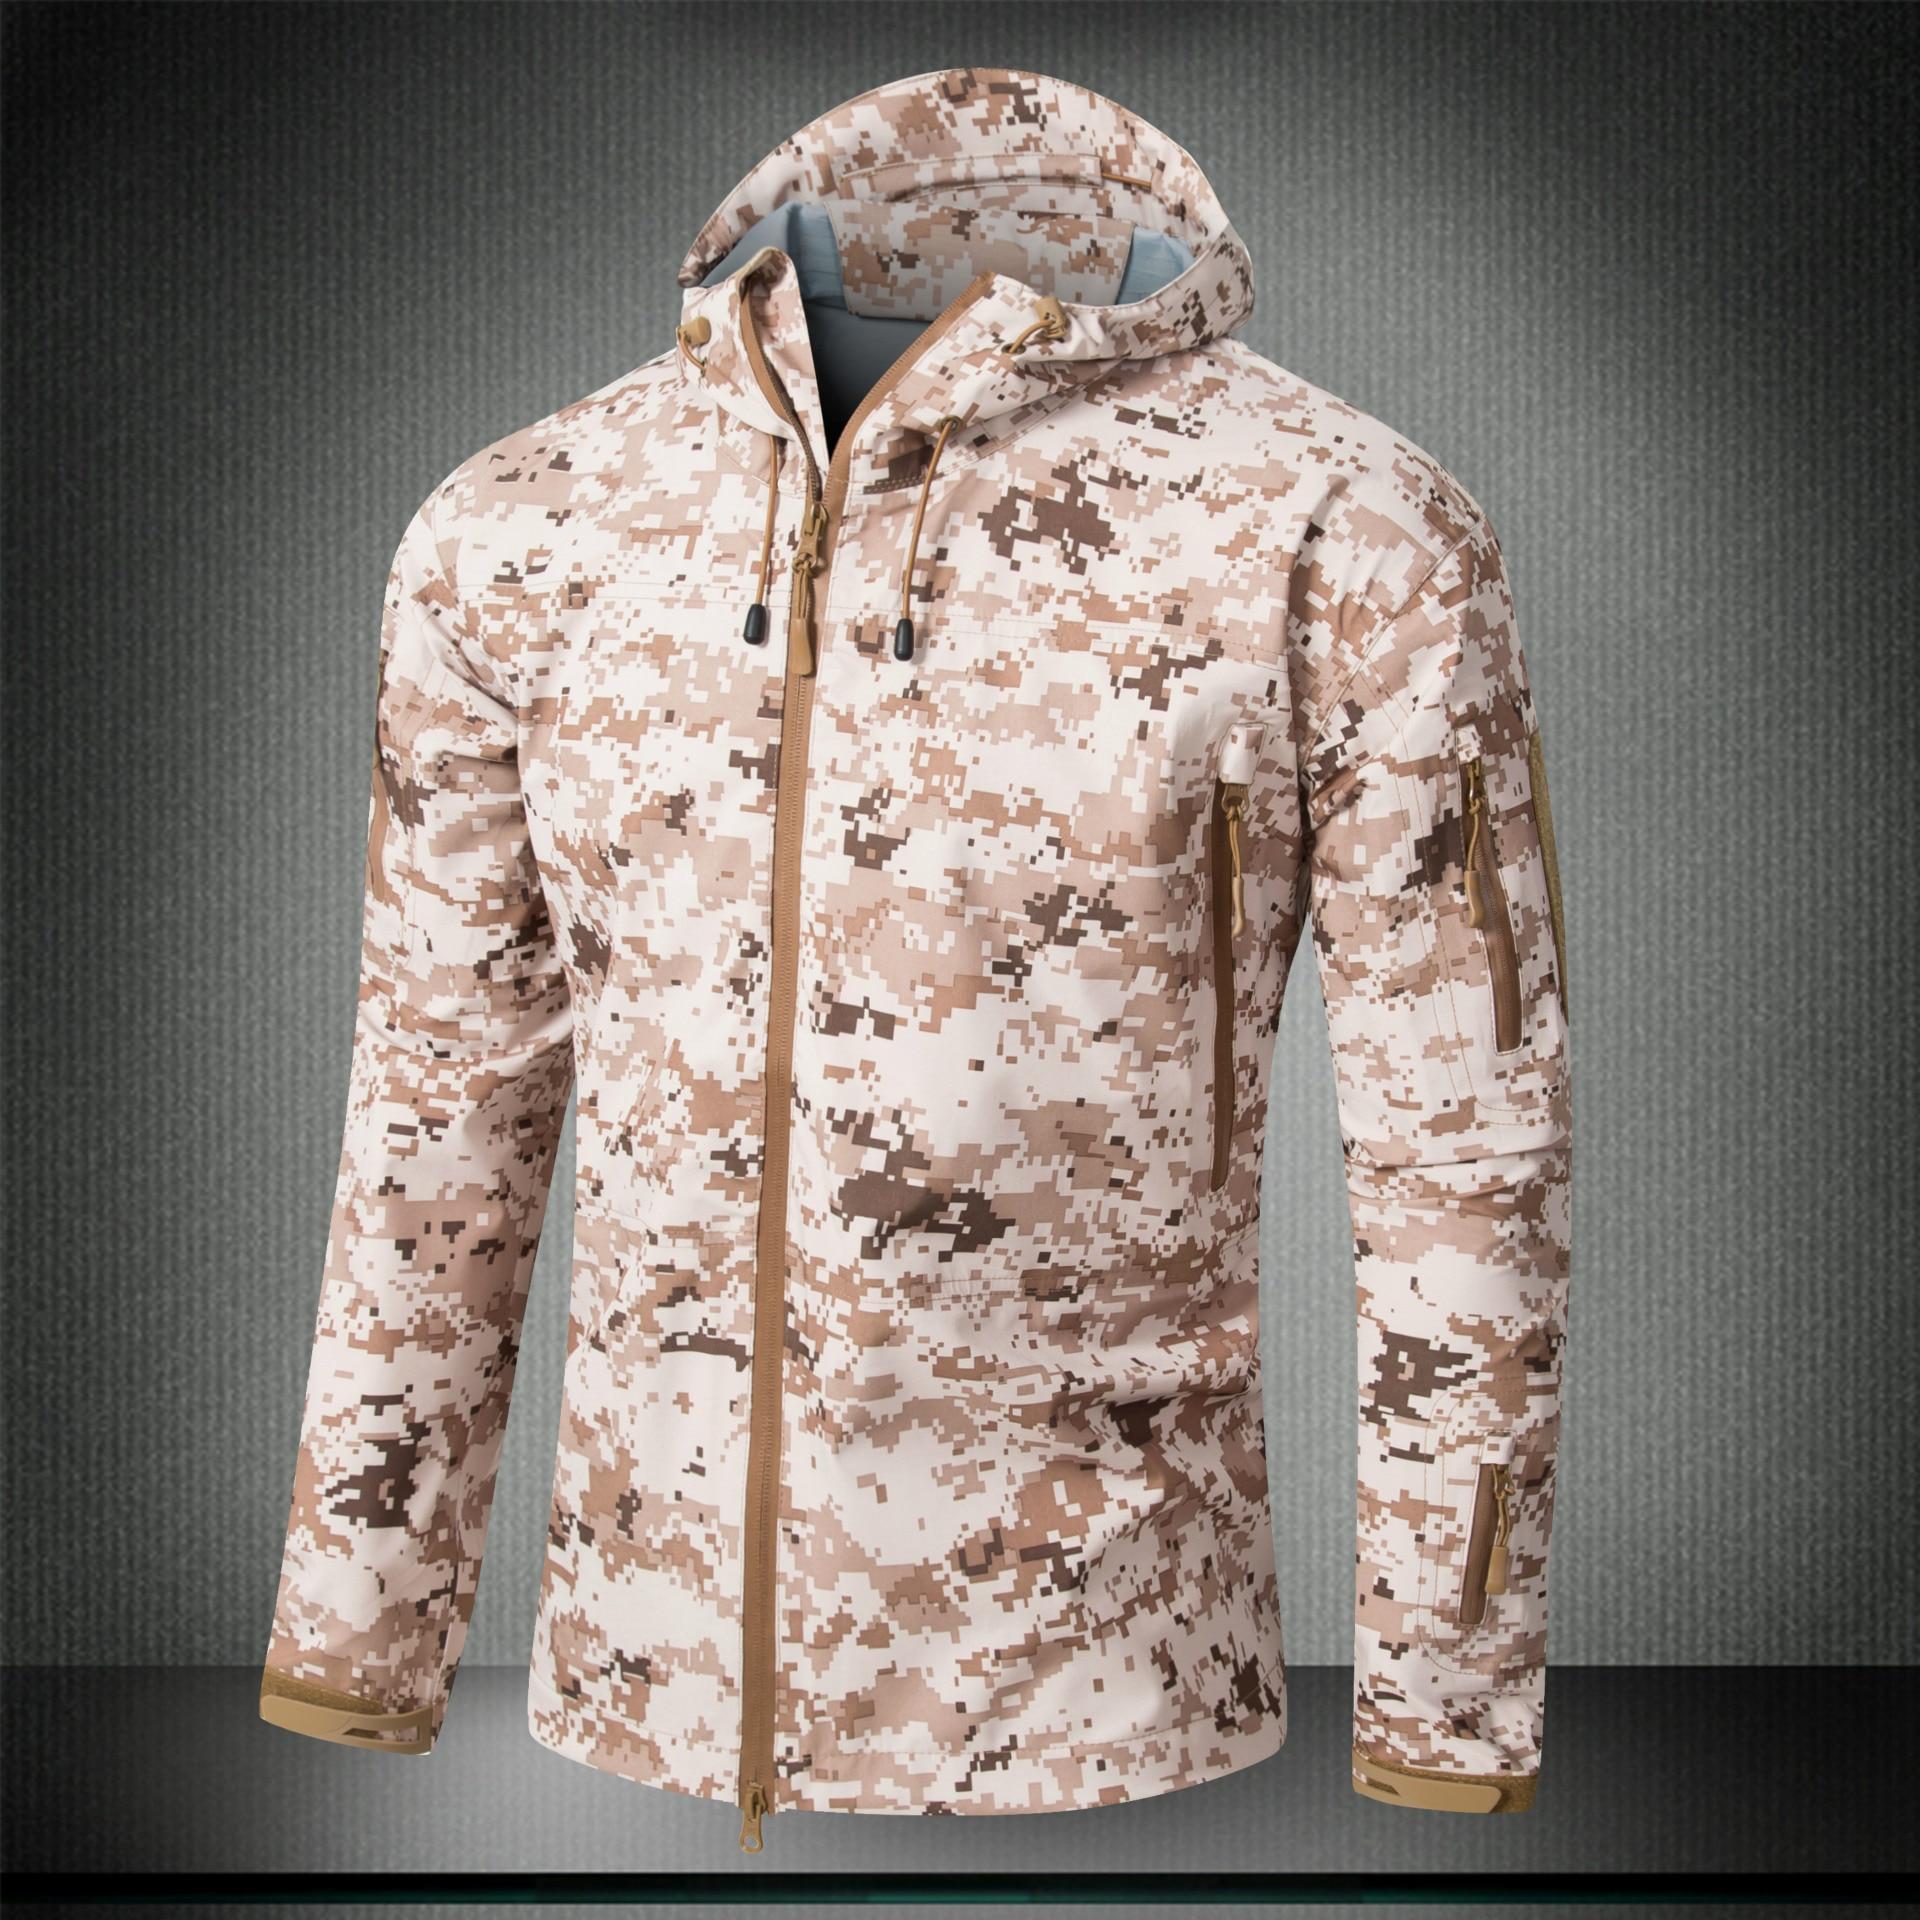 Men's Jacket Waterproof Hardshell Coat Hunting Military Tactical Outdoors Clothing Desert Digital Camouflage